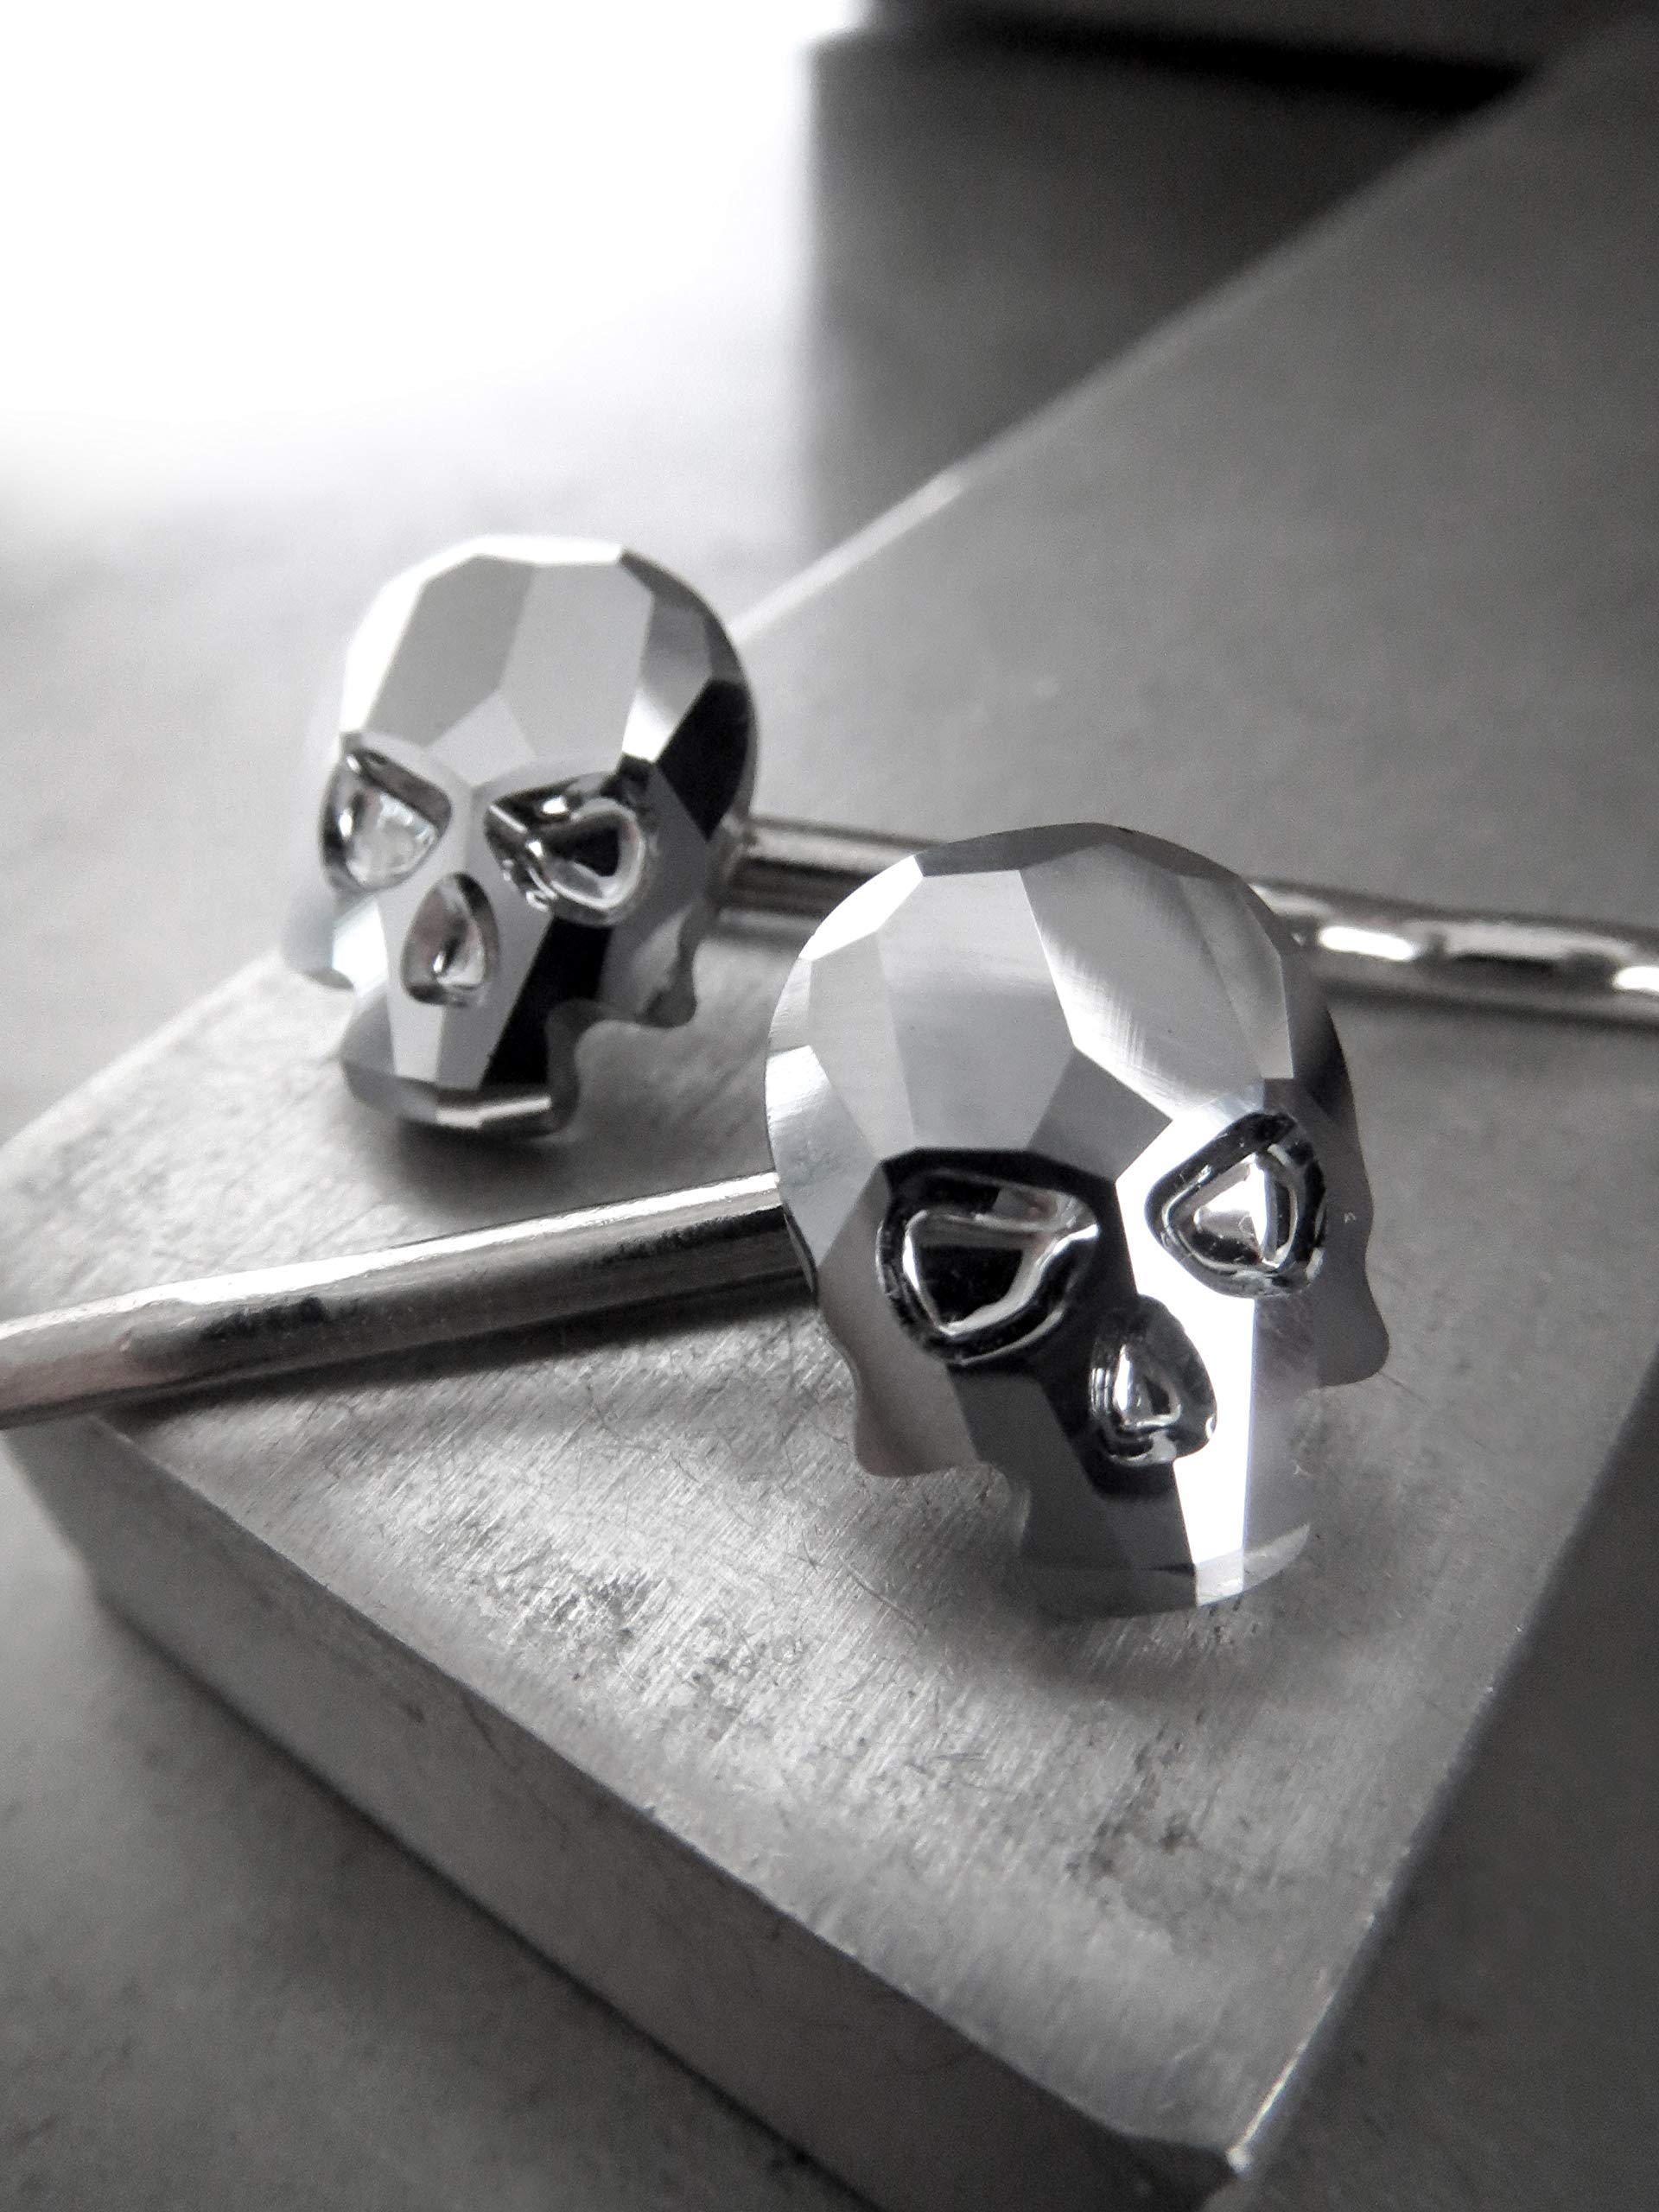 Swarovski Crystal Skull Hair Pins in Metallic Chrome - Set of 2 - Gothic Halloween Jewelry